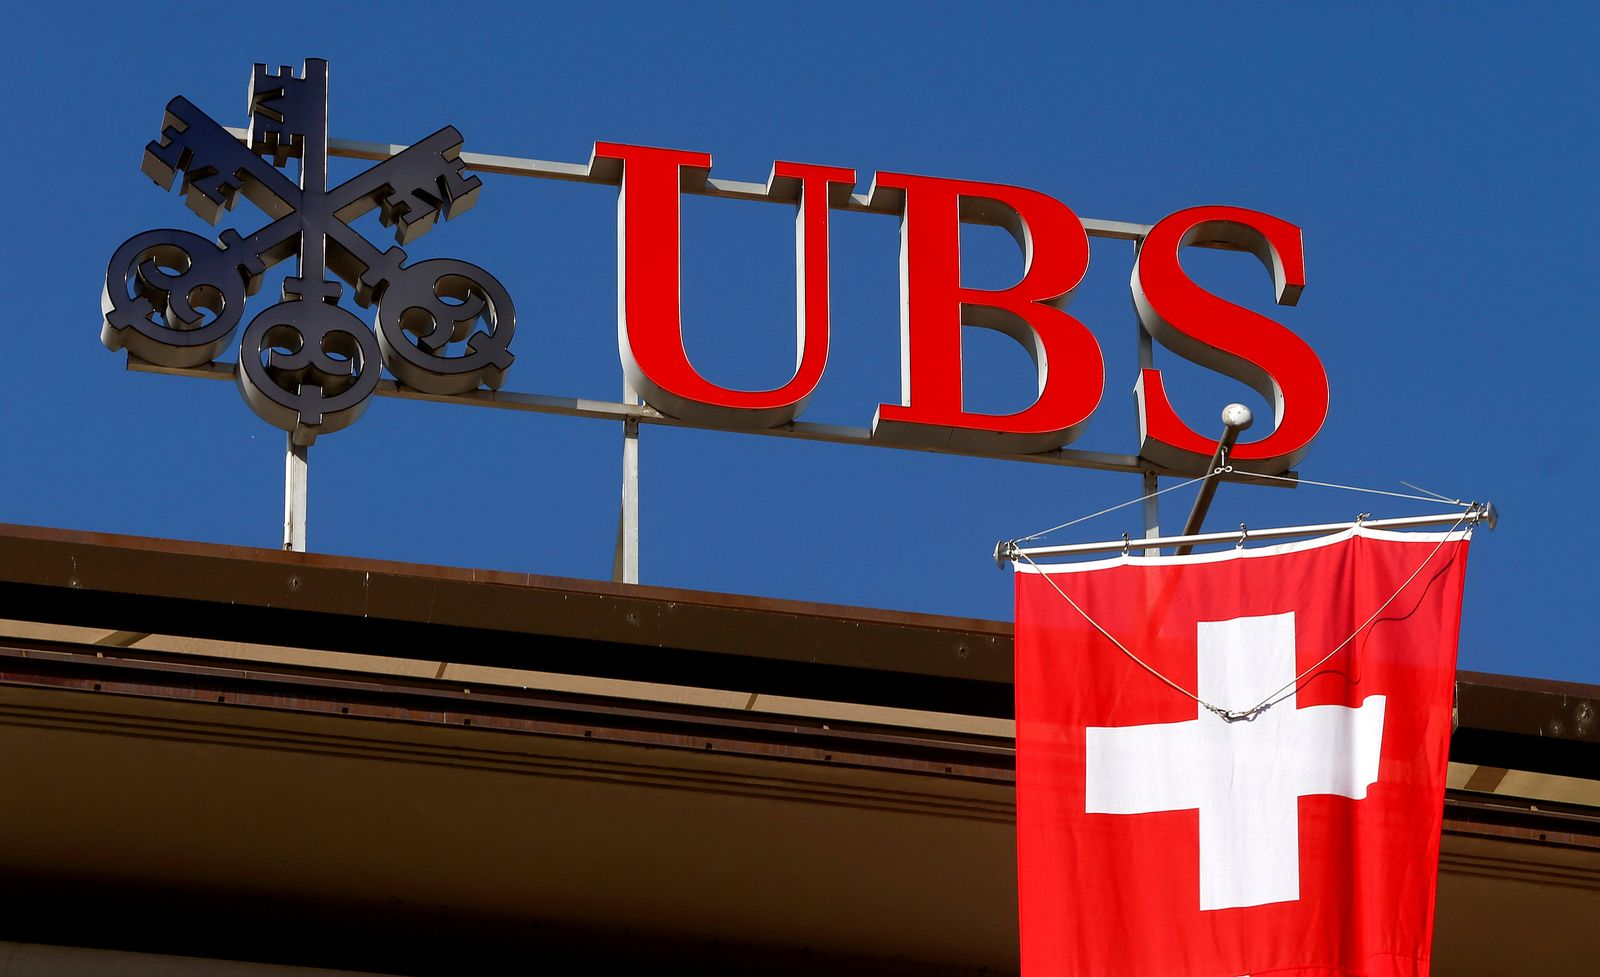 UBS GROUP-LAWSUIT/